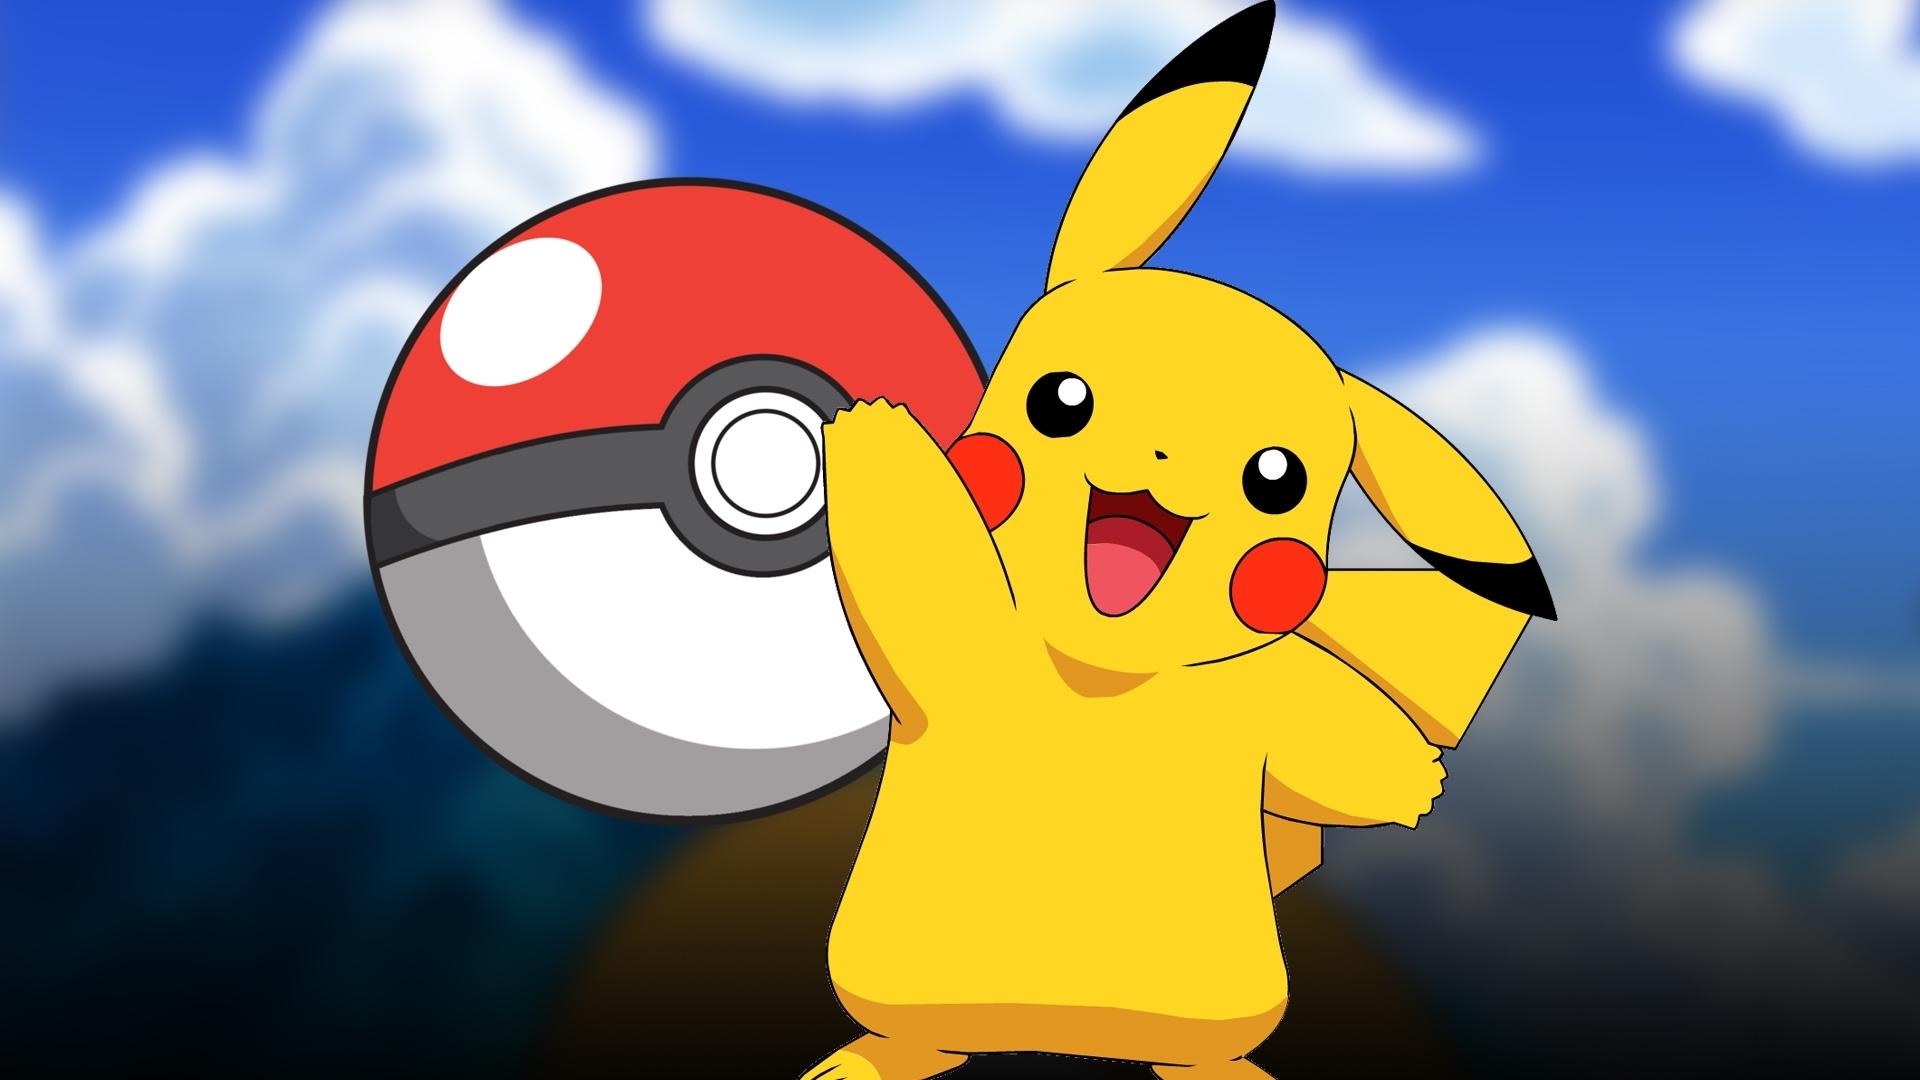 catch a pikachu wearing a party hat in pokémon go for pokémon day